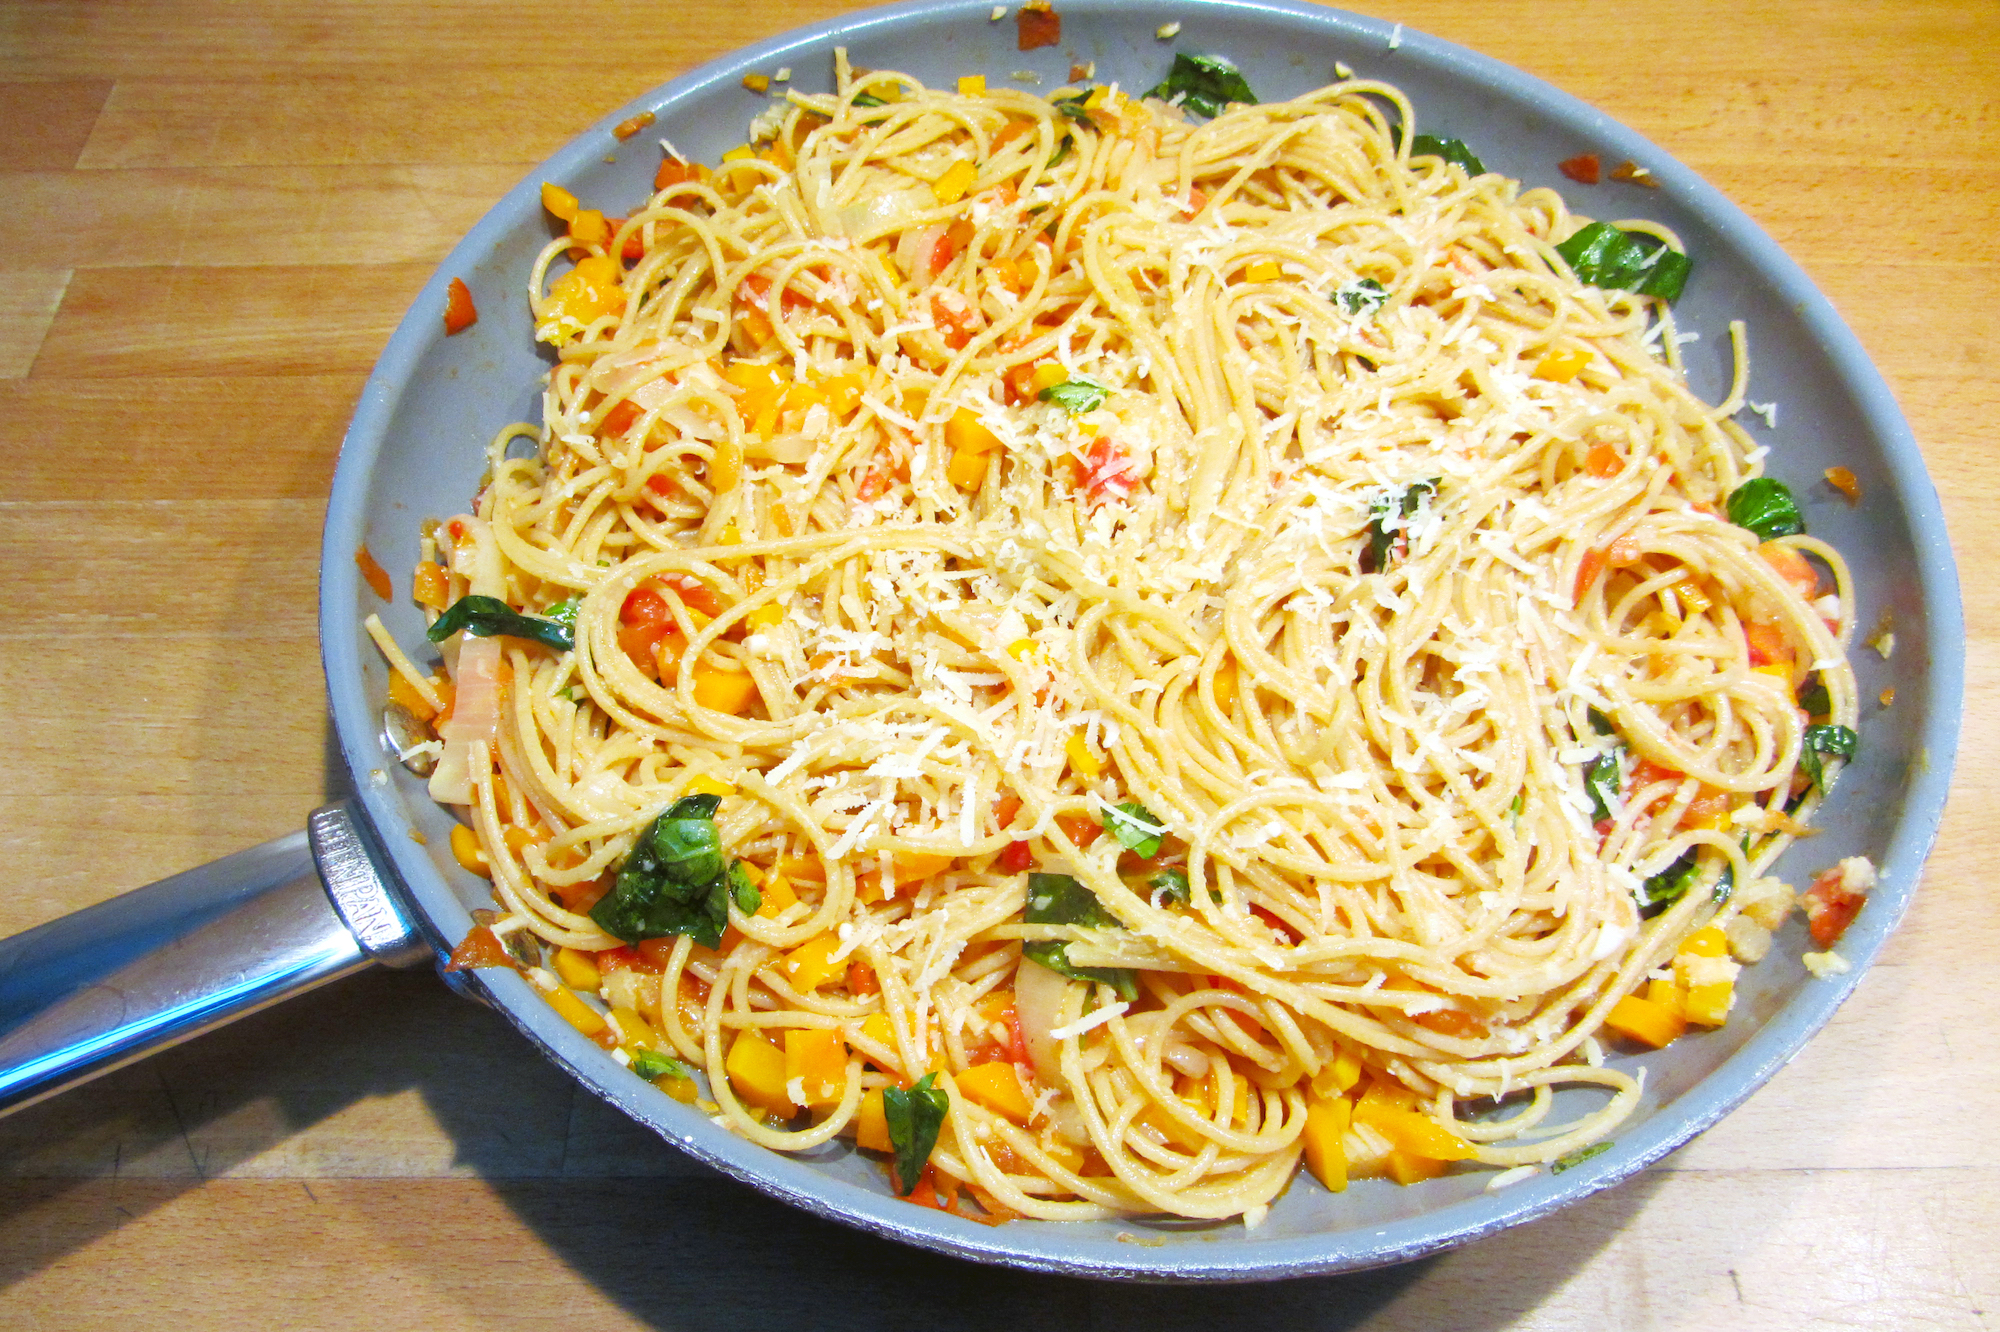 Volkorenspaghetti met een groentesausje (Antonio Carluccio)